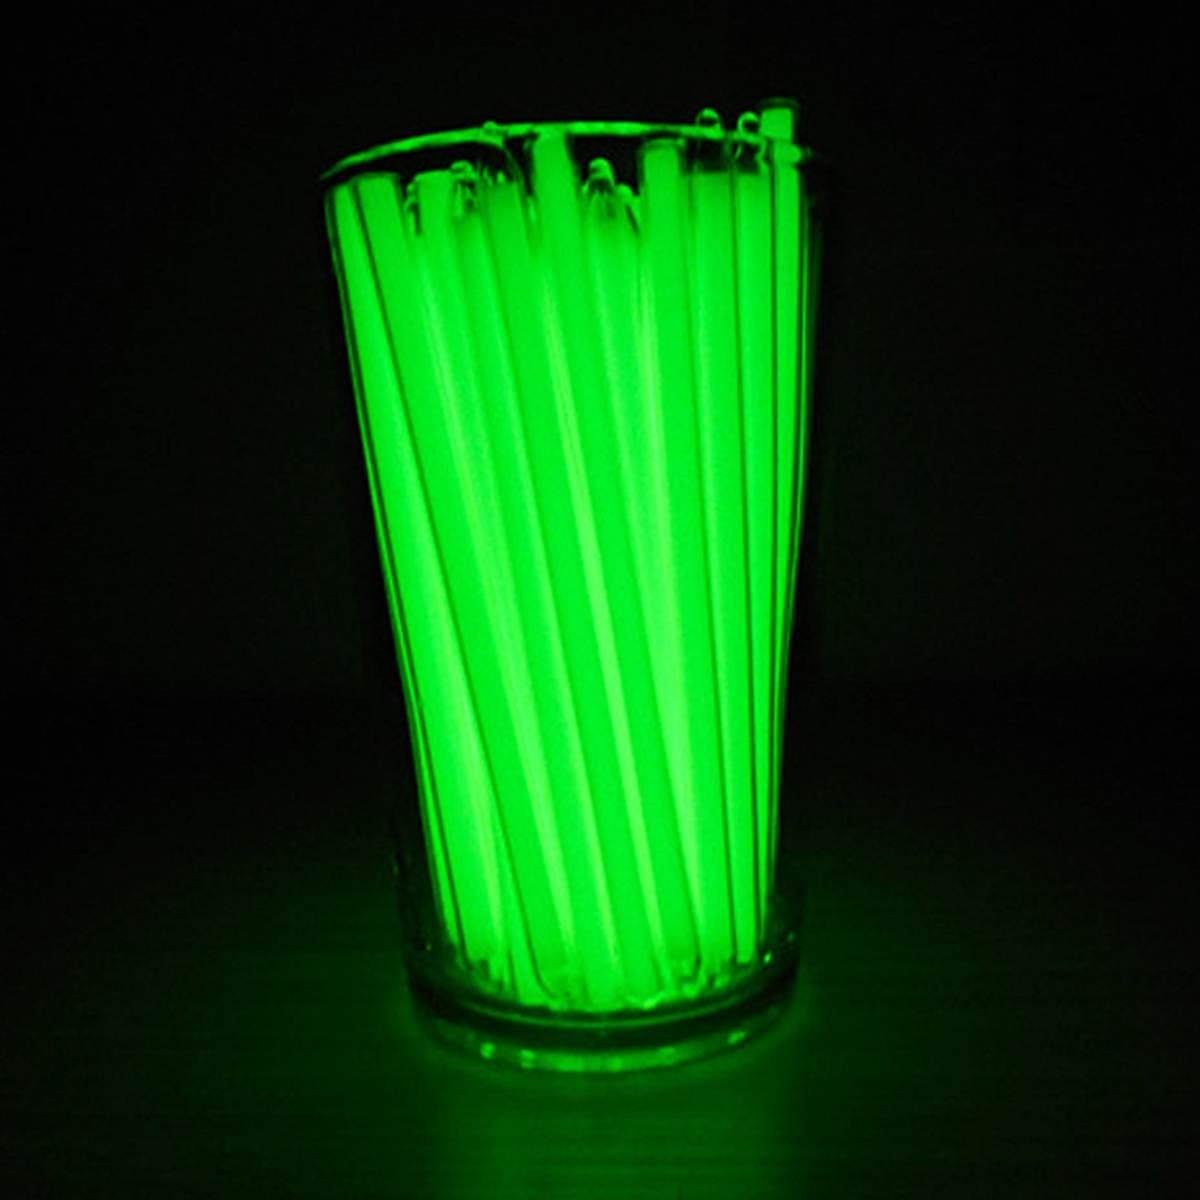 1pcs Trit Vials Tritium Self-luminous 15-Years 5x100mm (Flashlight Accessories)